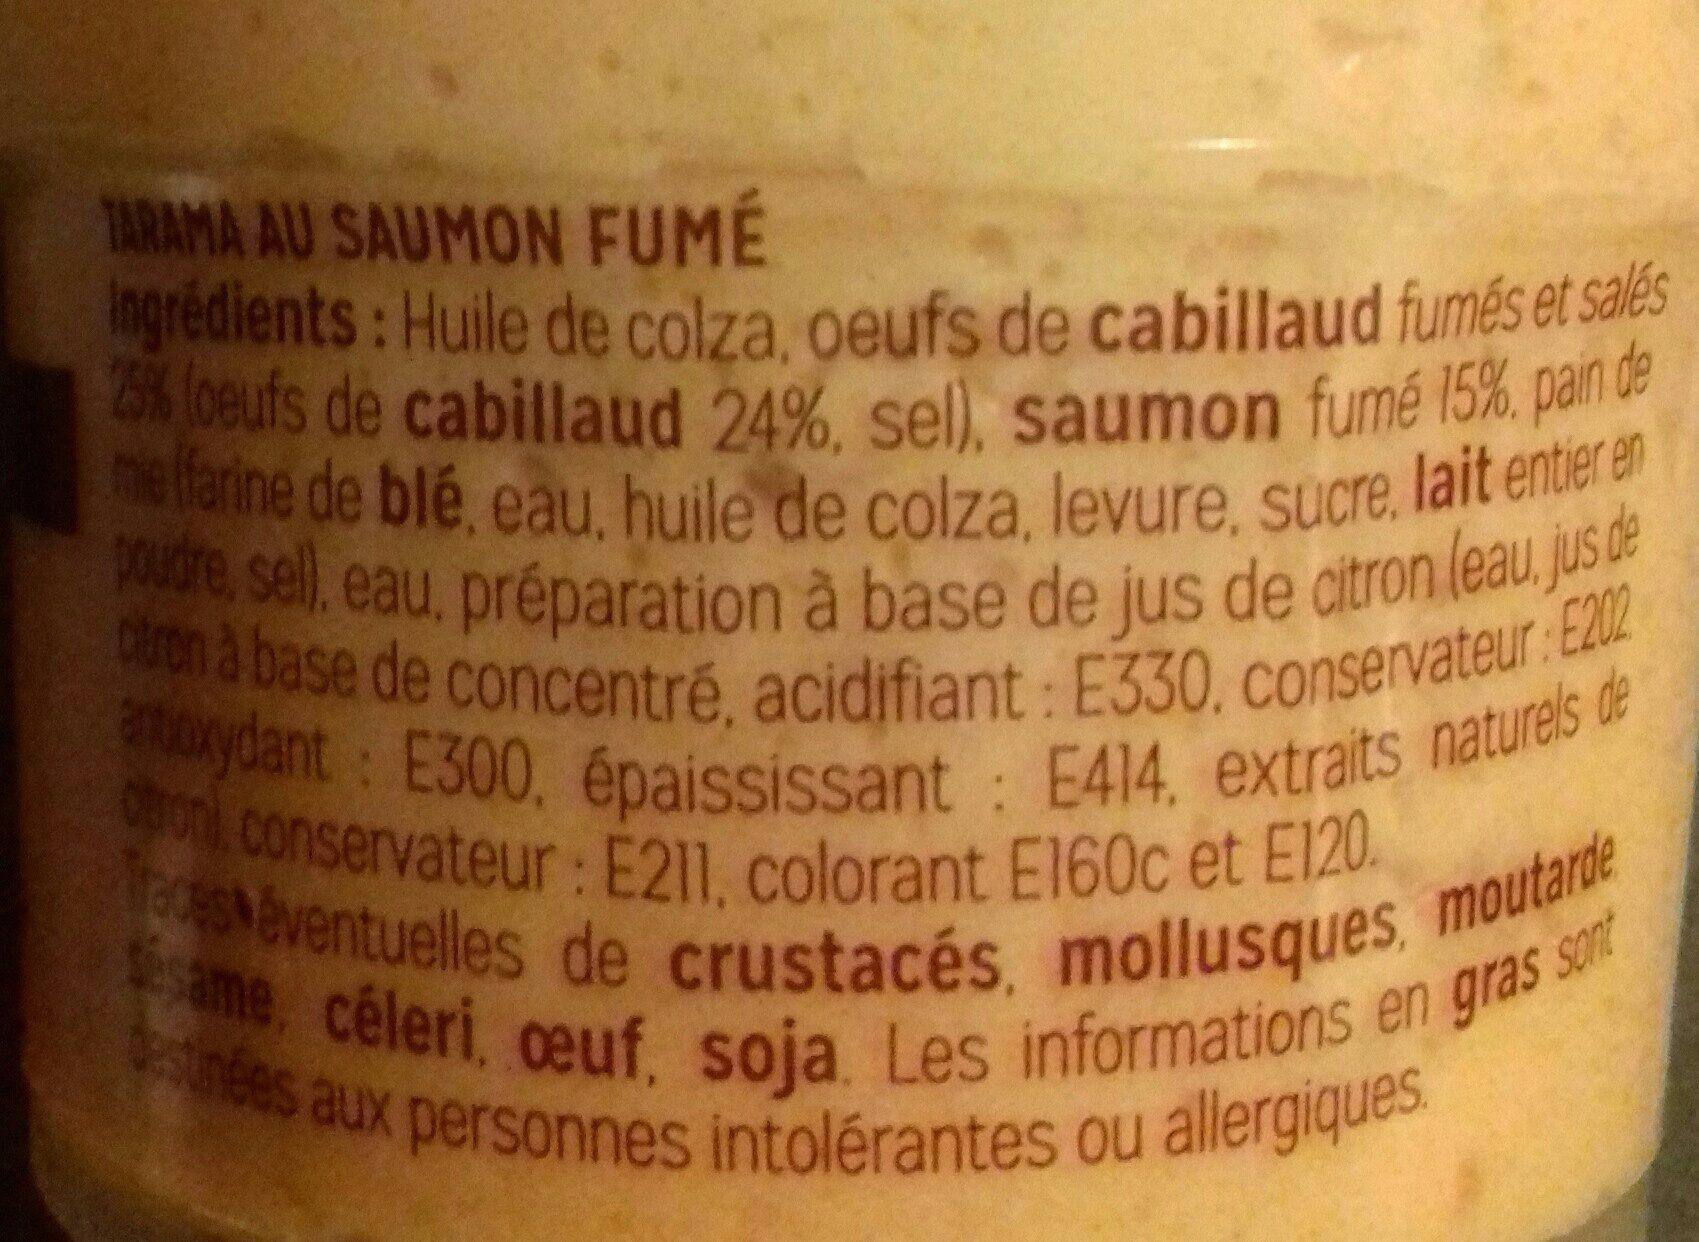 Tarama au saumon fumé - Ingredients